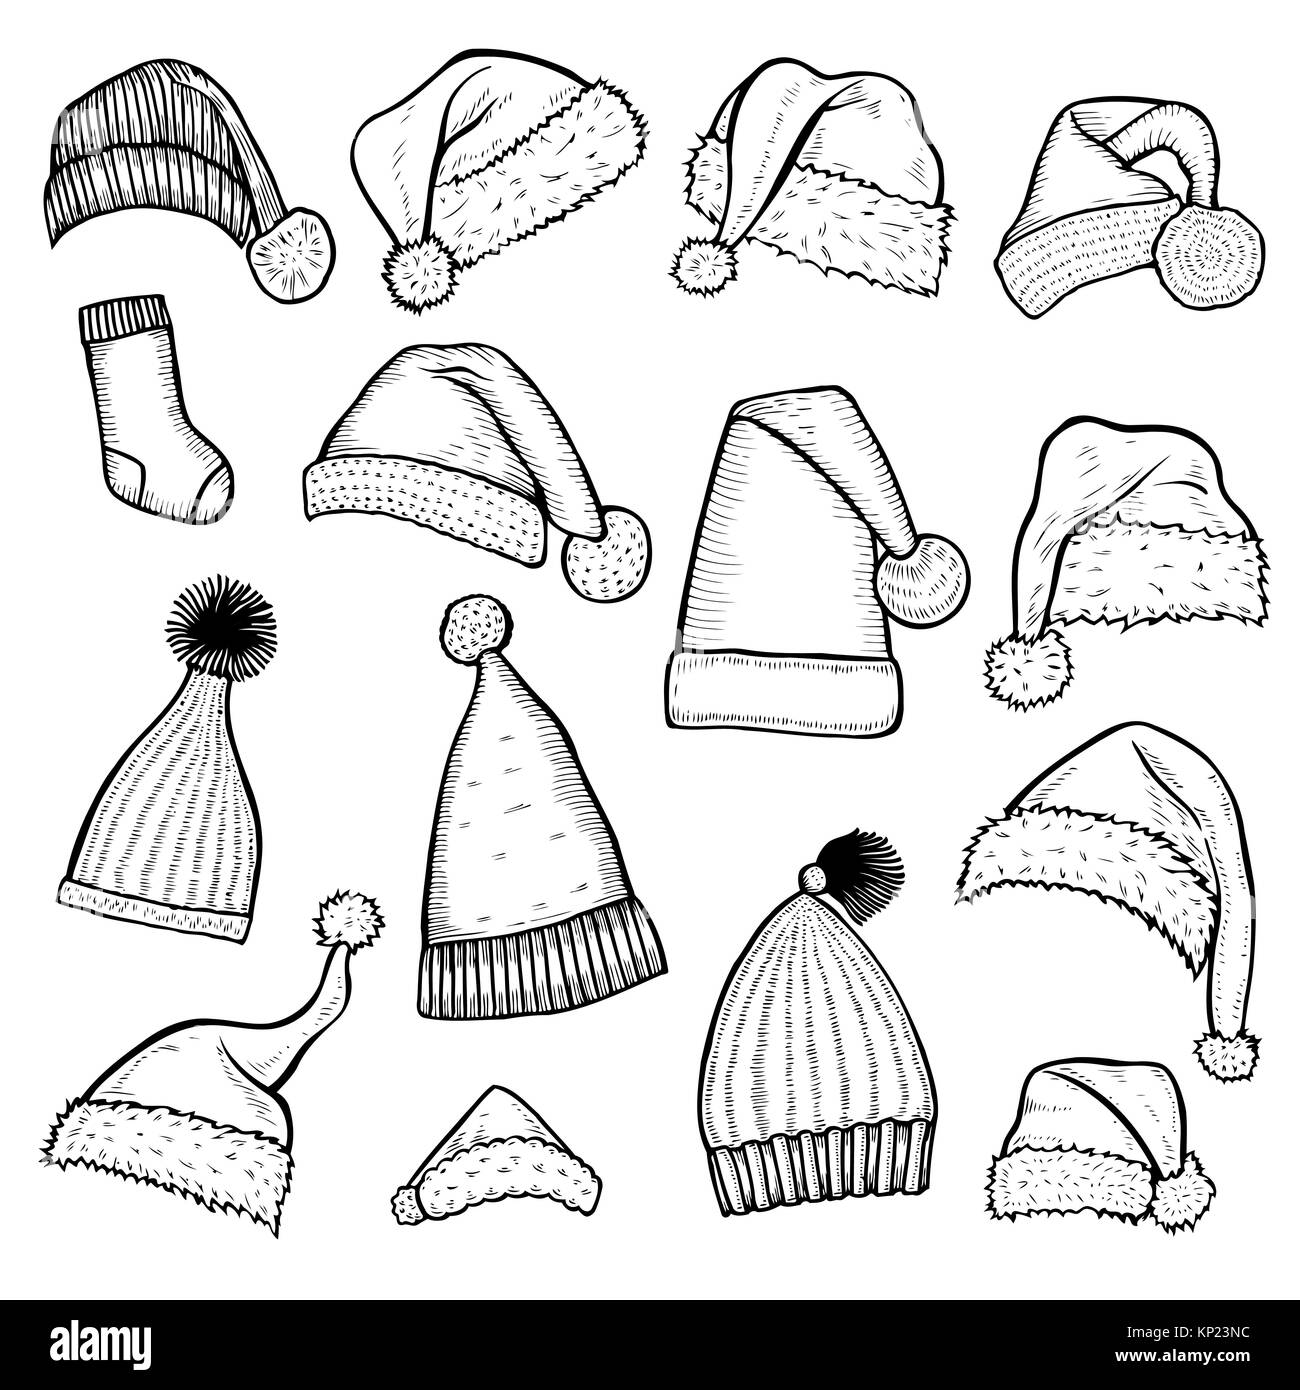 Santa Claus Hat Beard Sock Illustration Drawing Engraving